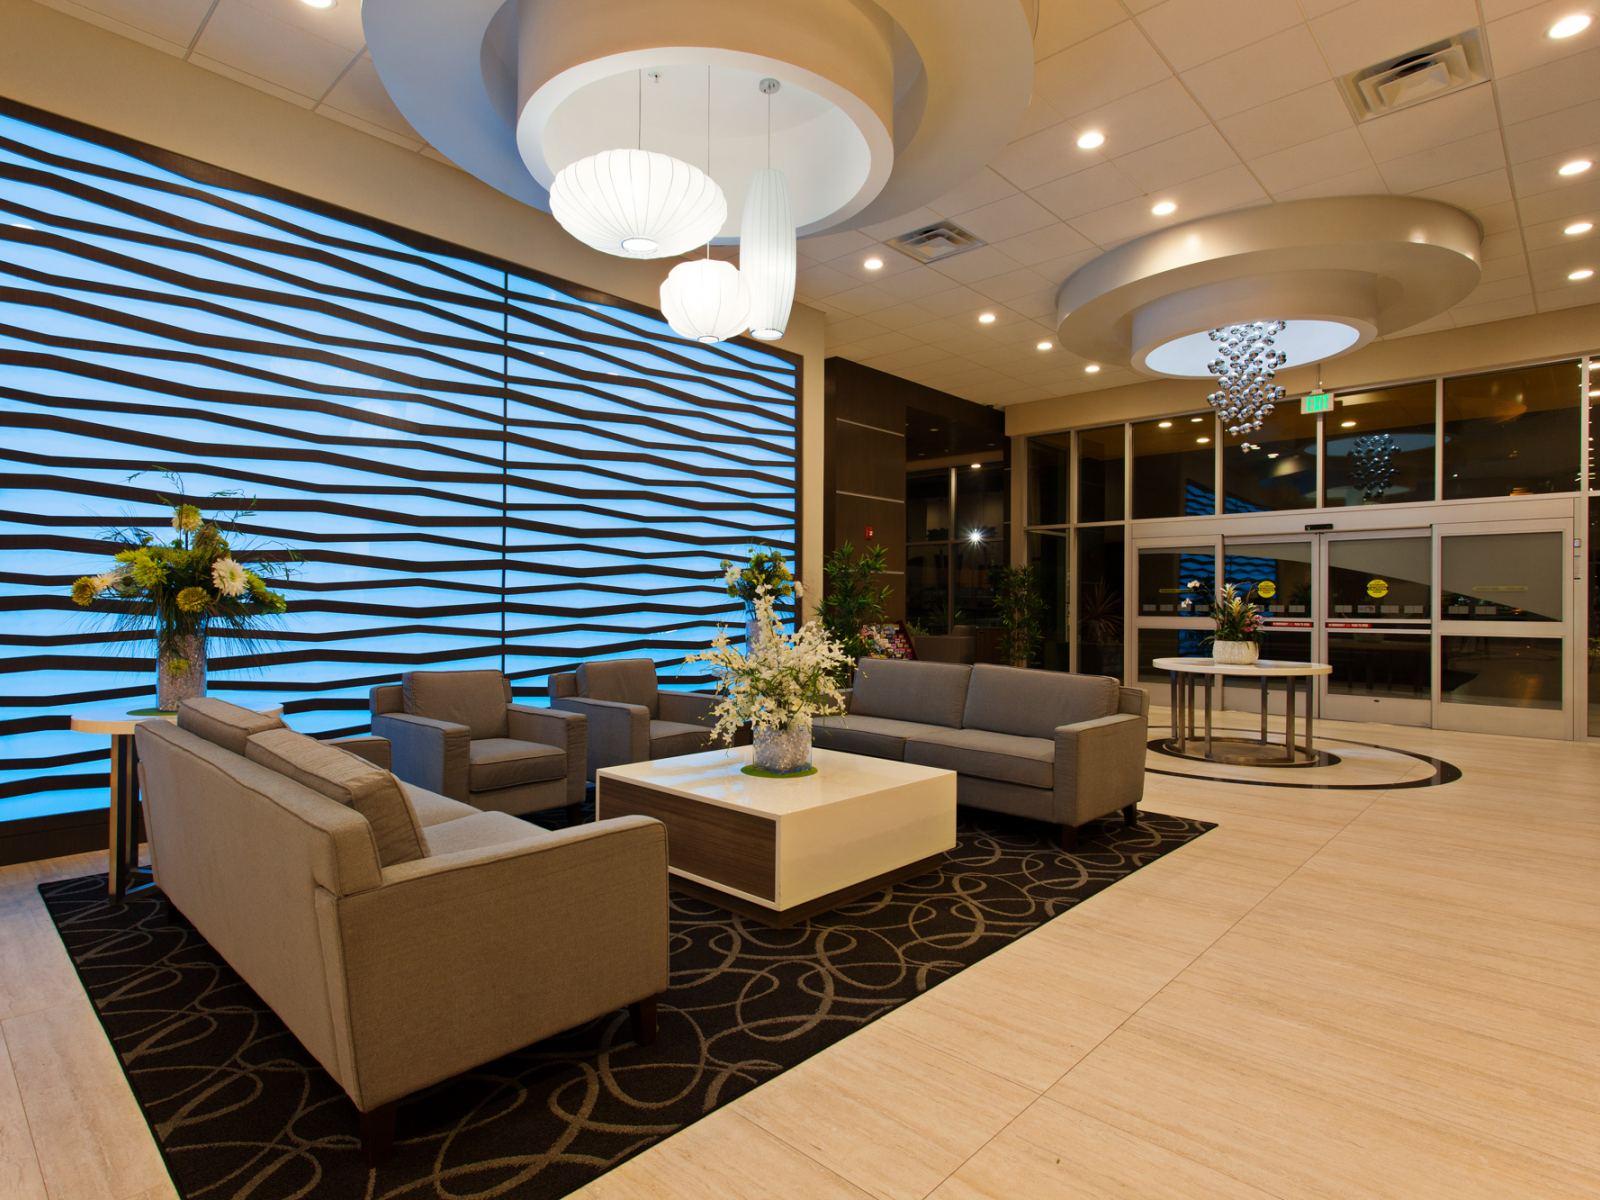 Holiday Inn Express North Hollywood lobby